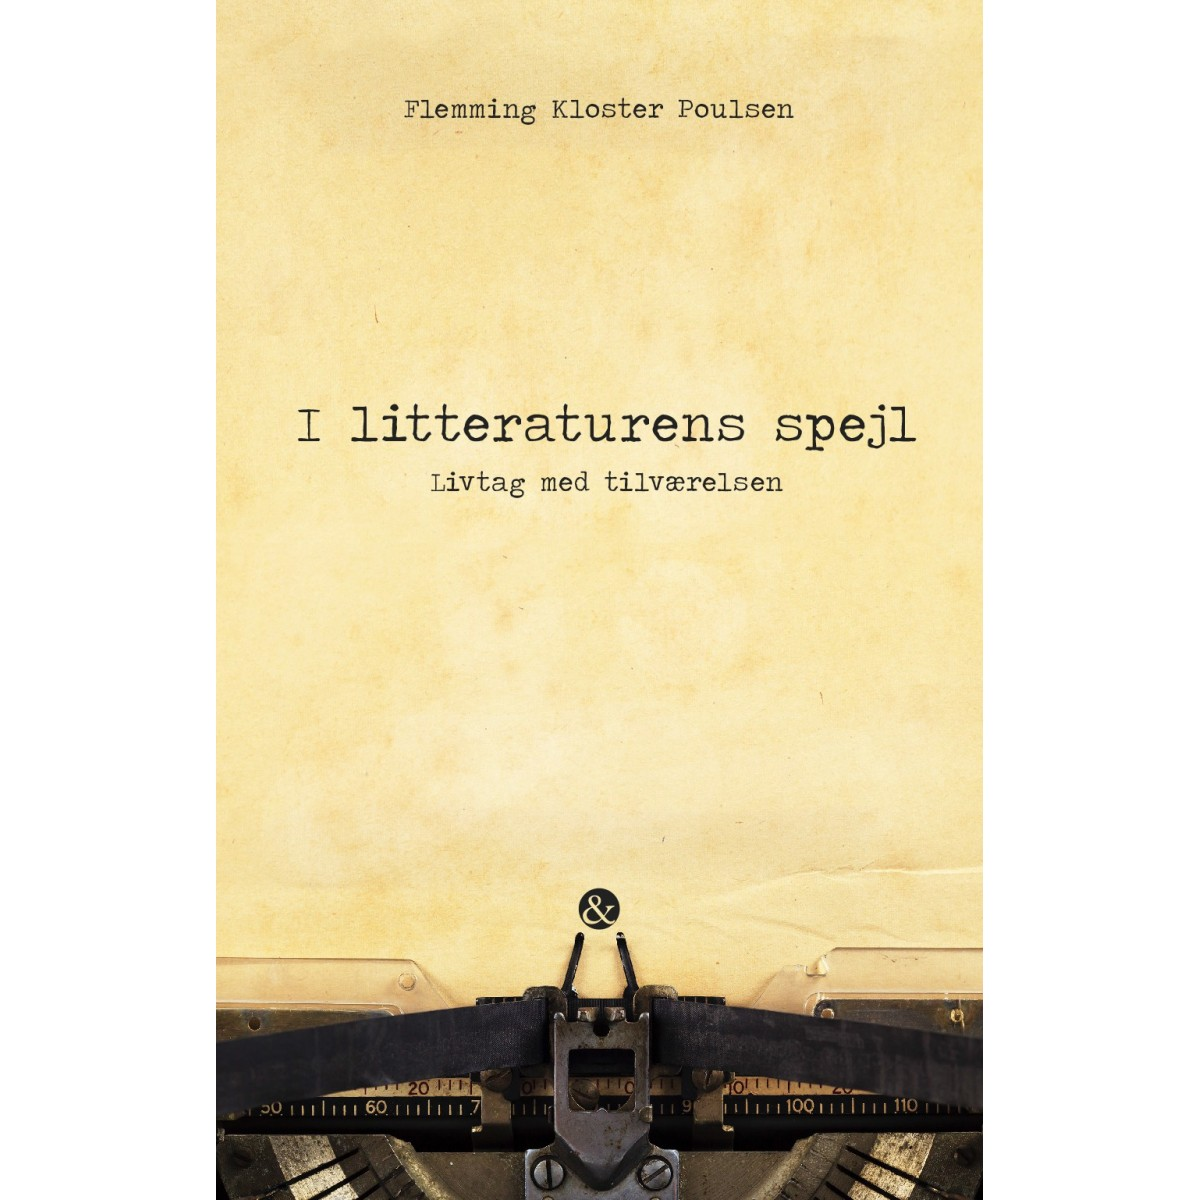 Flemming Kloster Poulsen: I litteraturens spejl